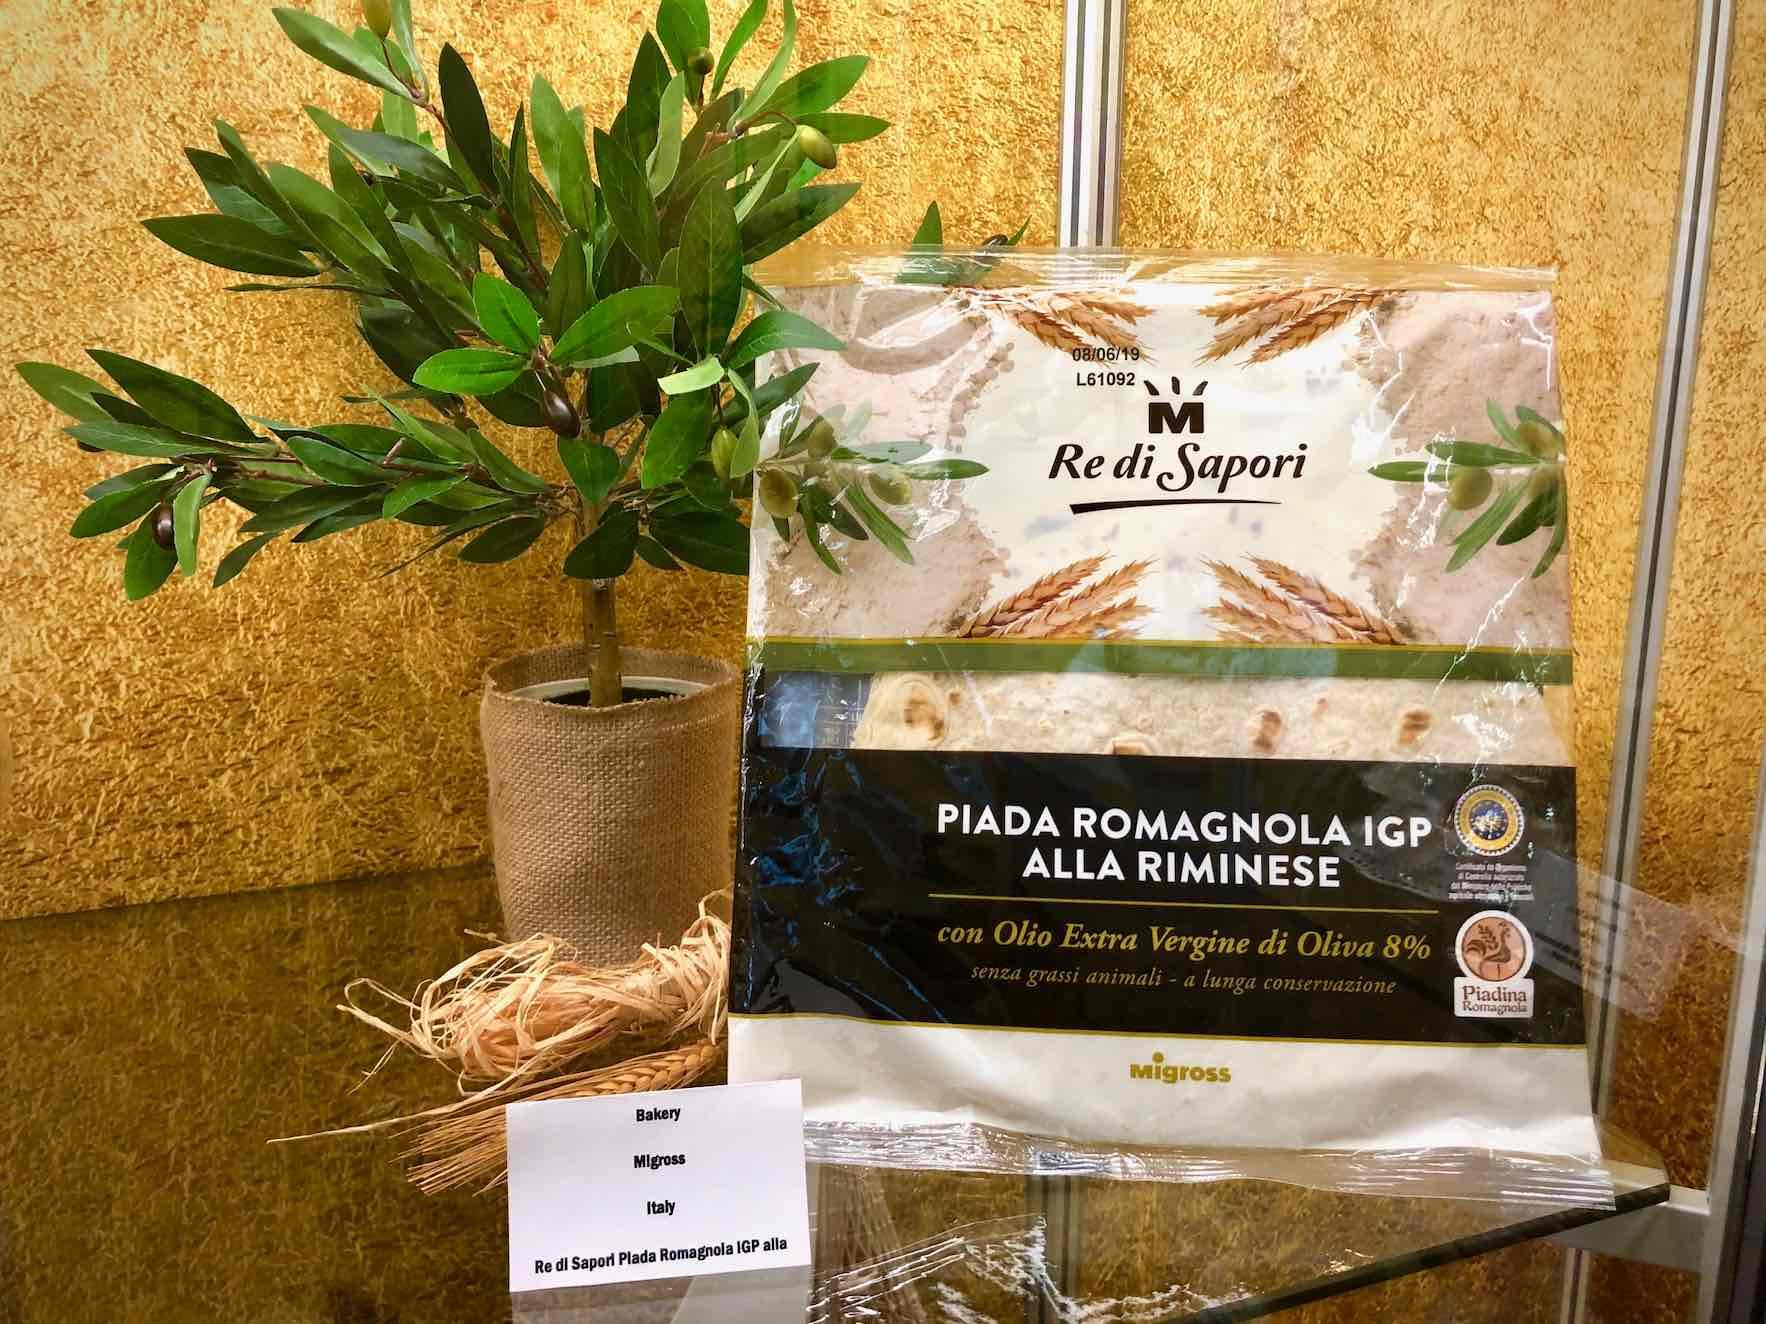 Piada-romagnola-Migross-re-di-sapori-Plma-copy-Fm